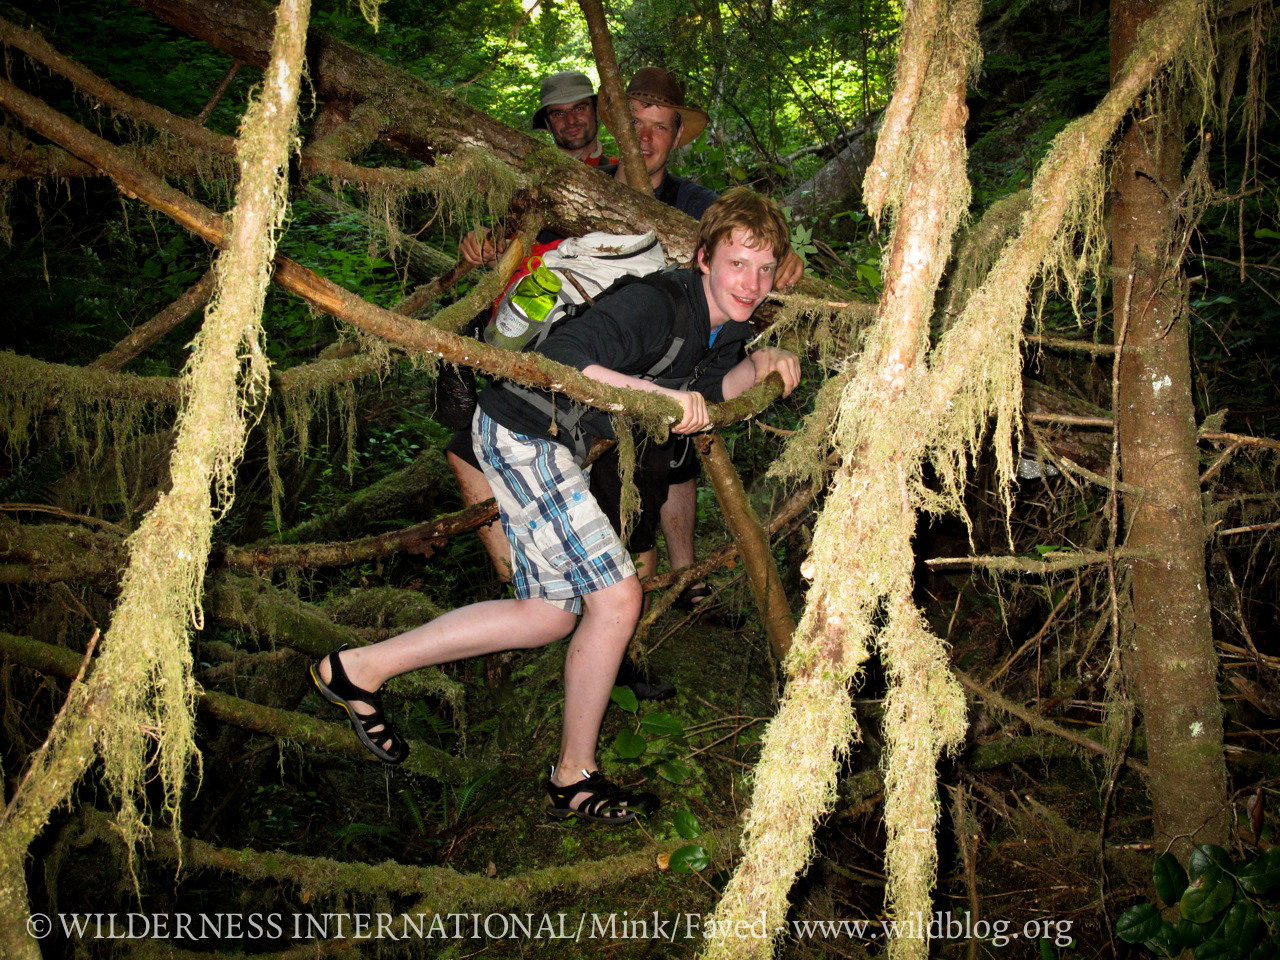 http://wi.wildblog.org/wp-content/uploads/2012/07/lr-1134.jpg